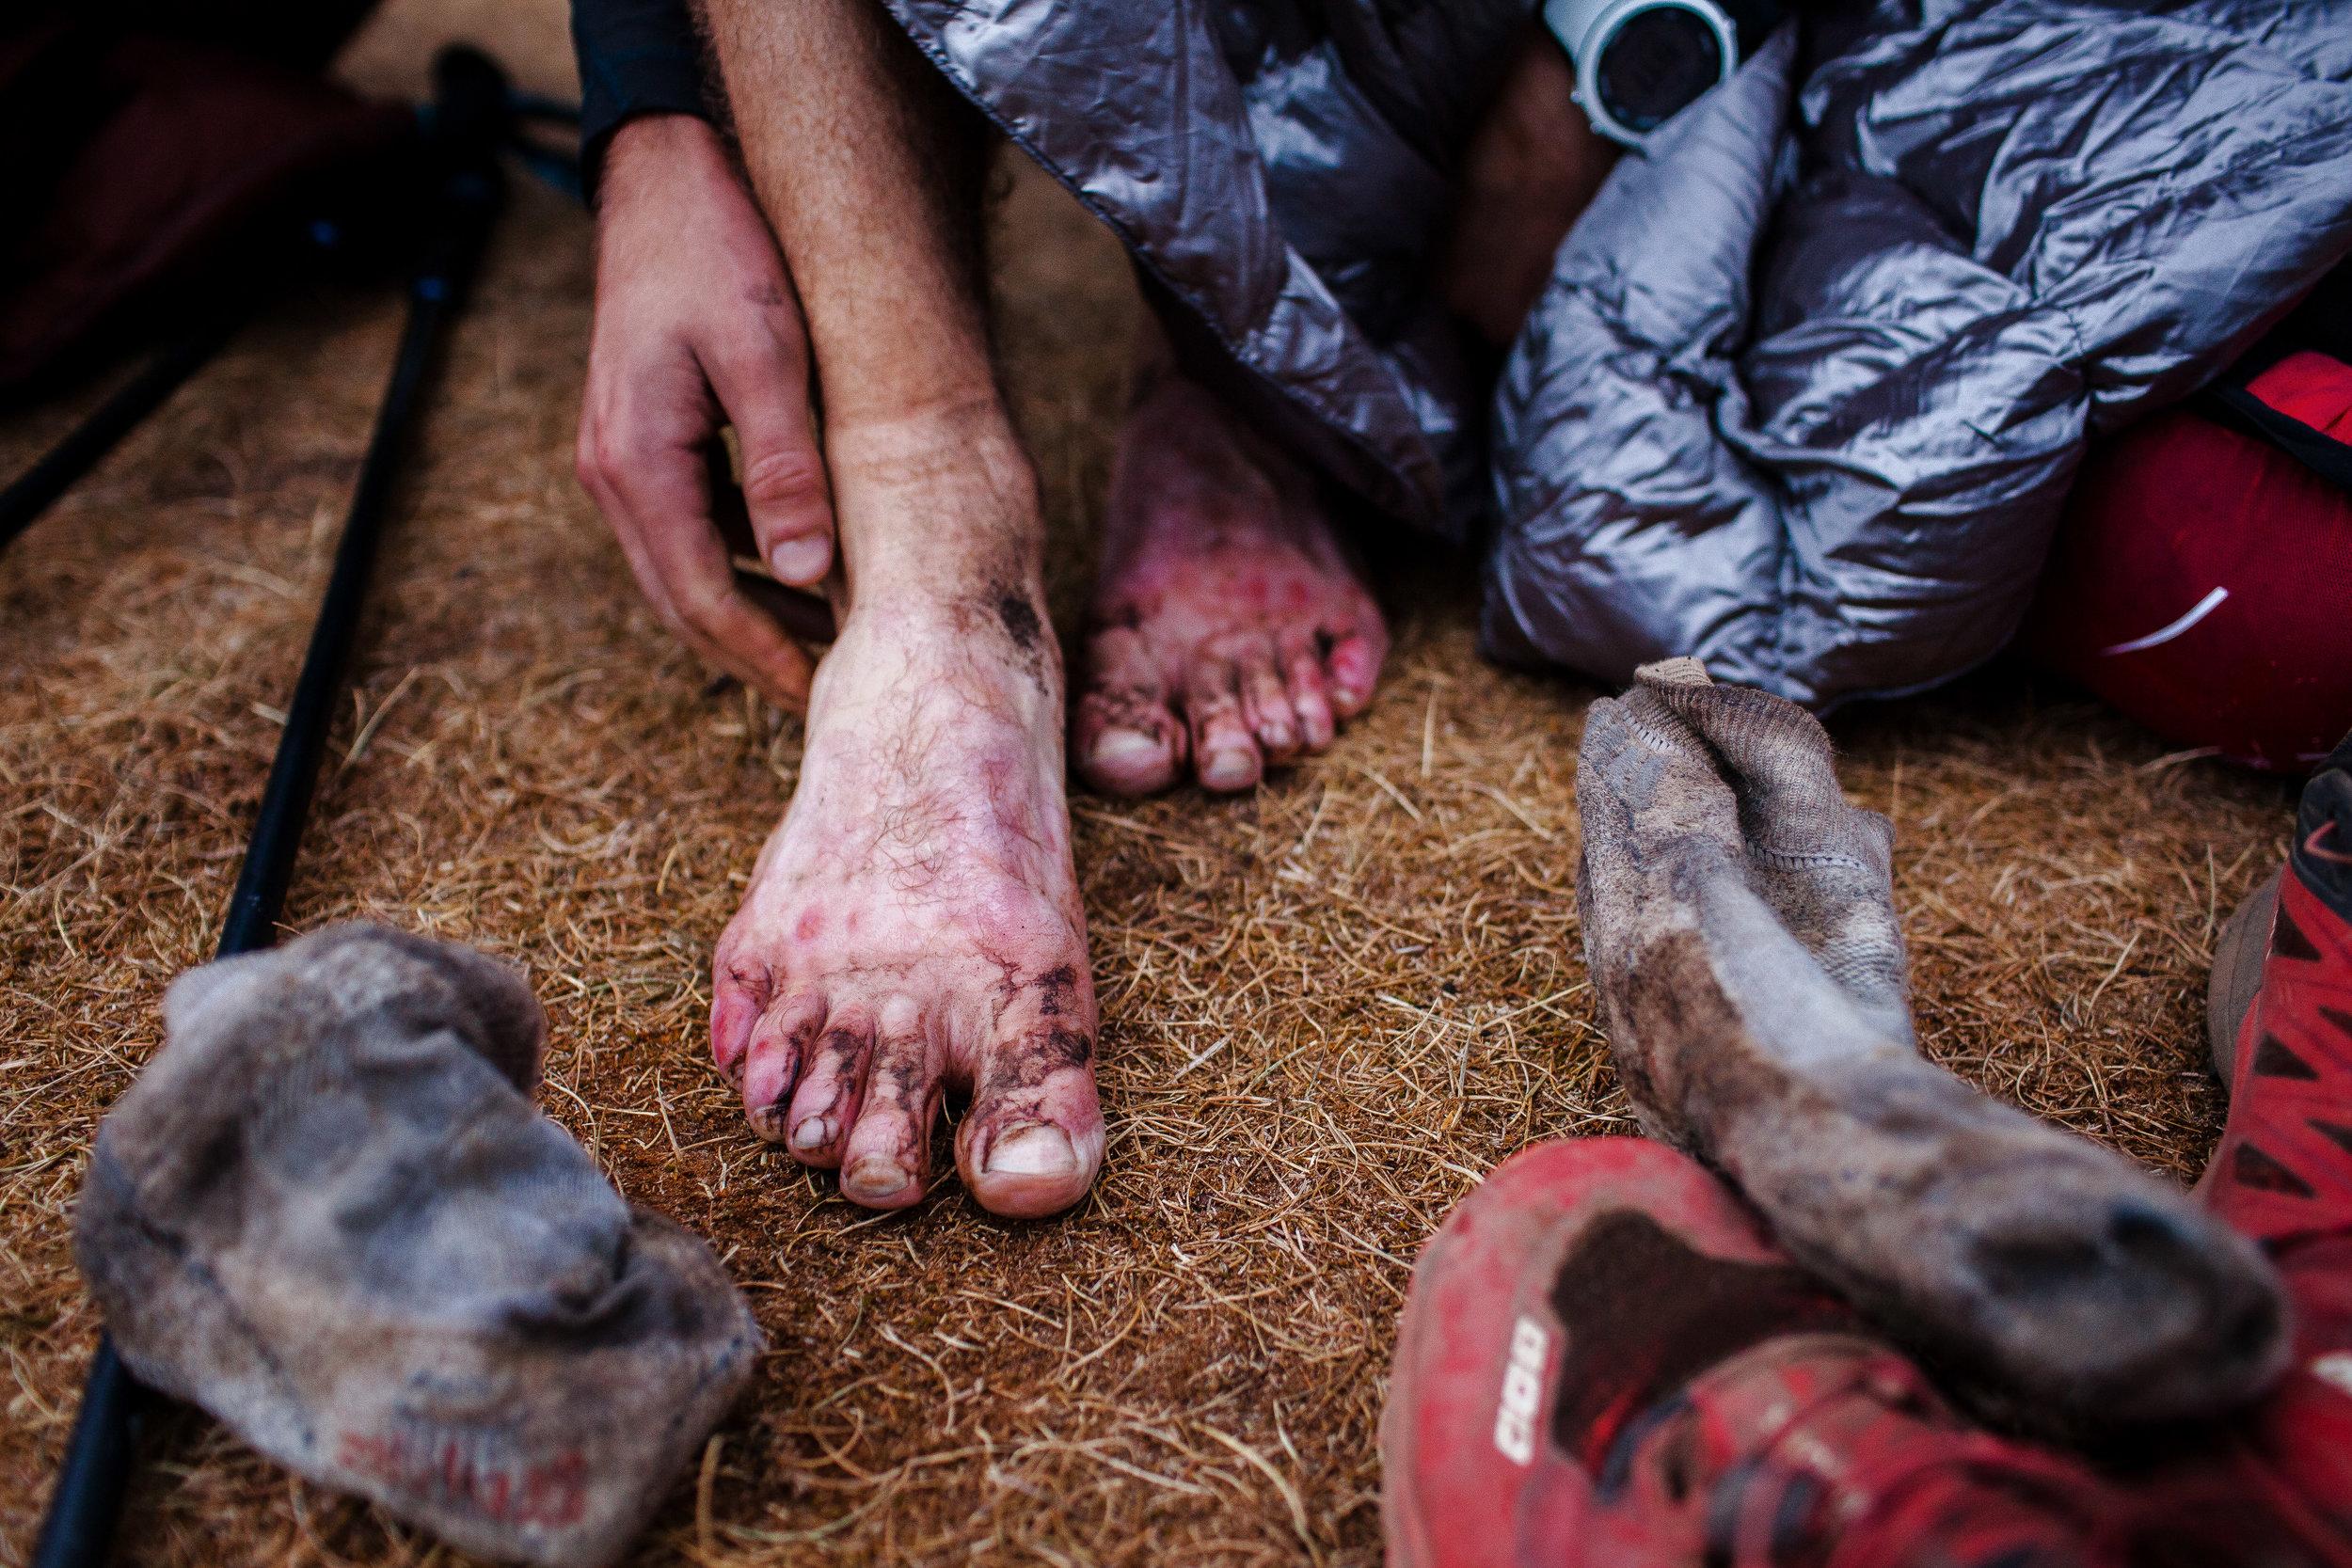 Elliott's battered feet after running the Fat Dog 120.